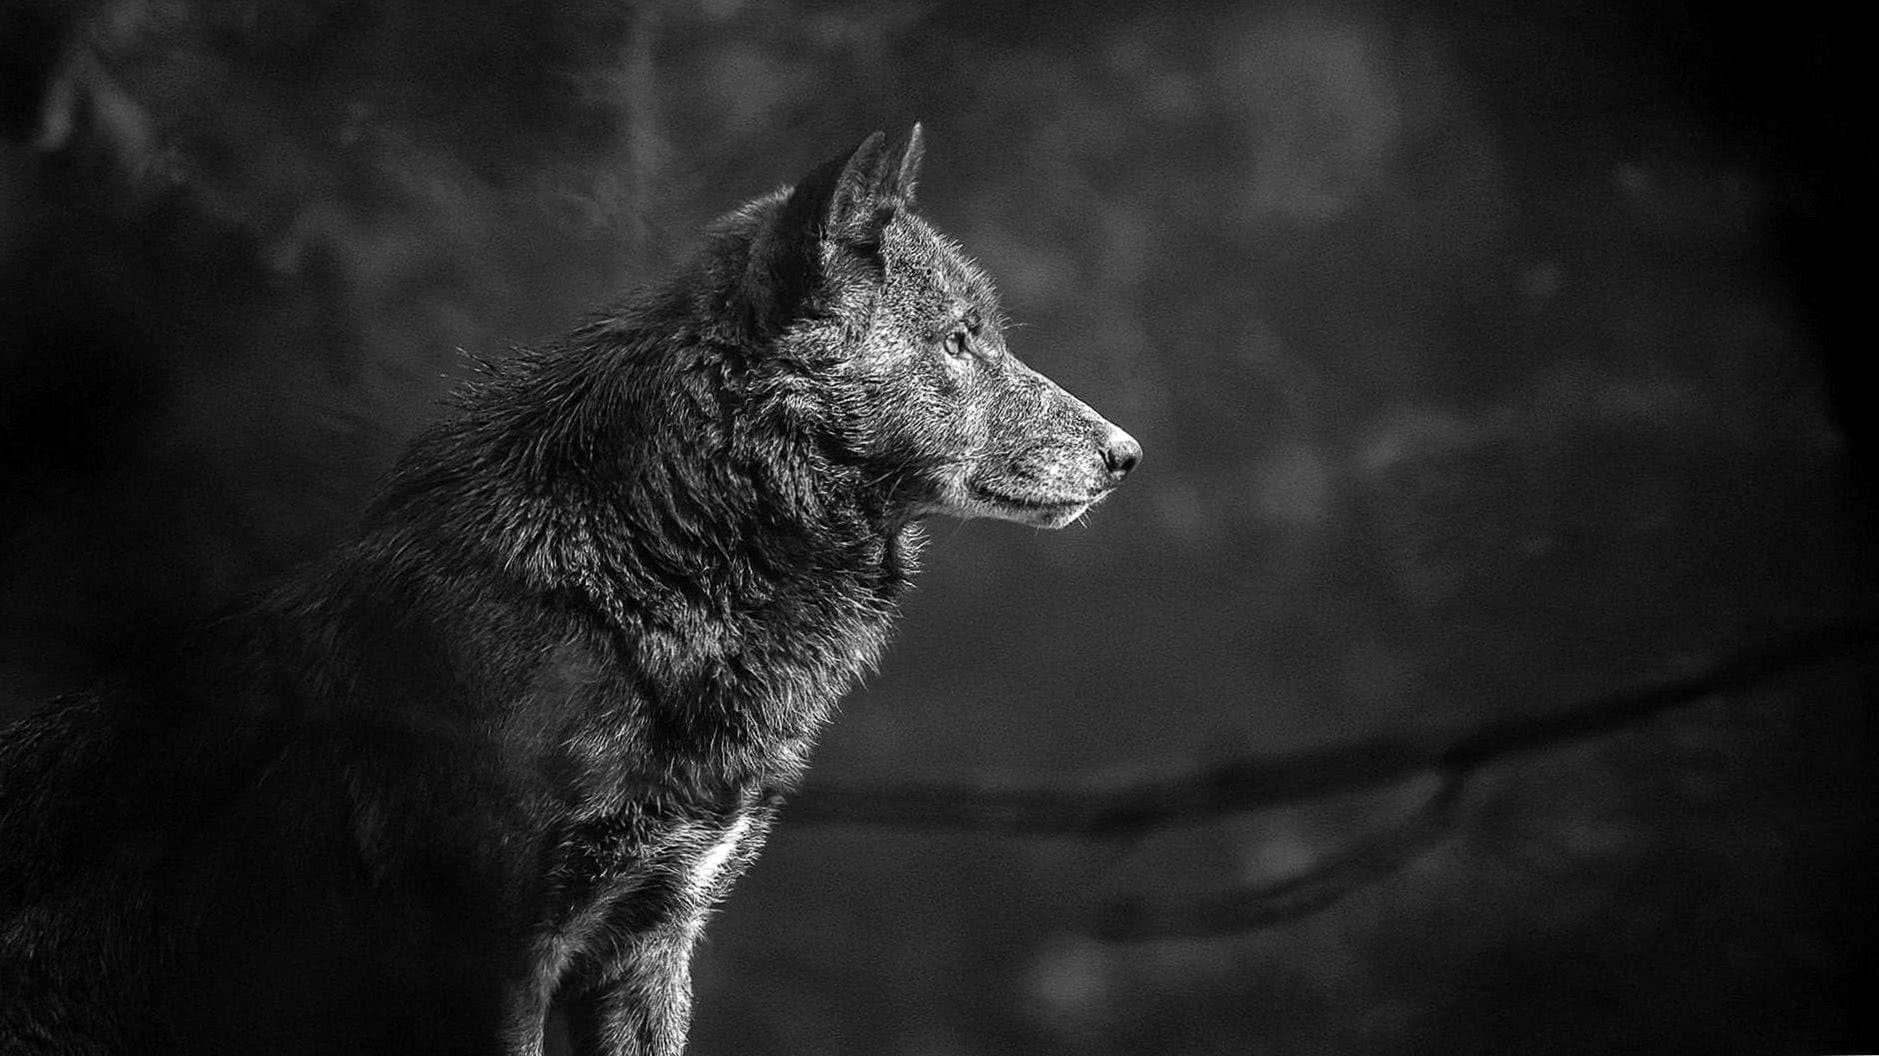 Wolf Art Wallpapers 4K